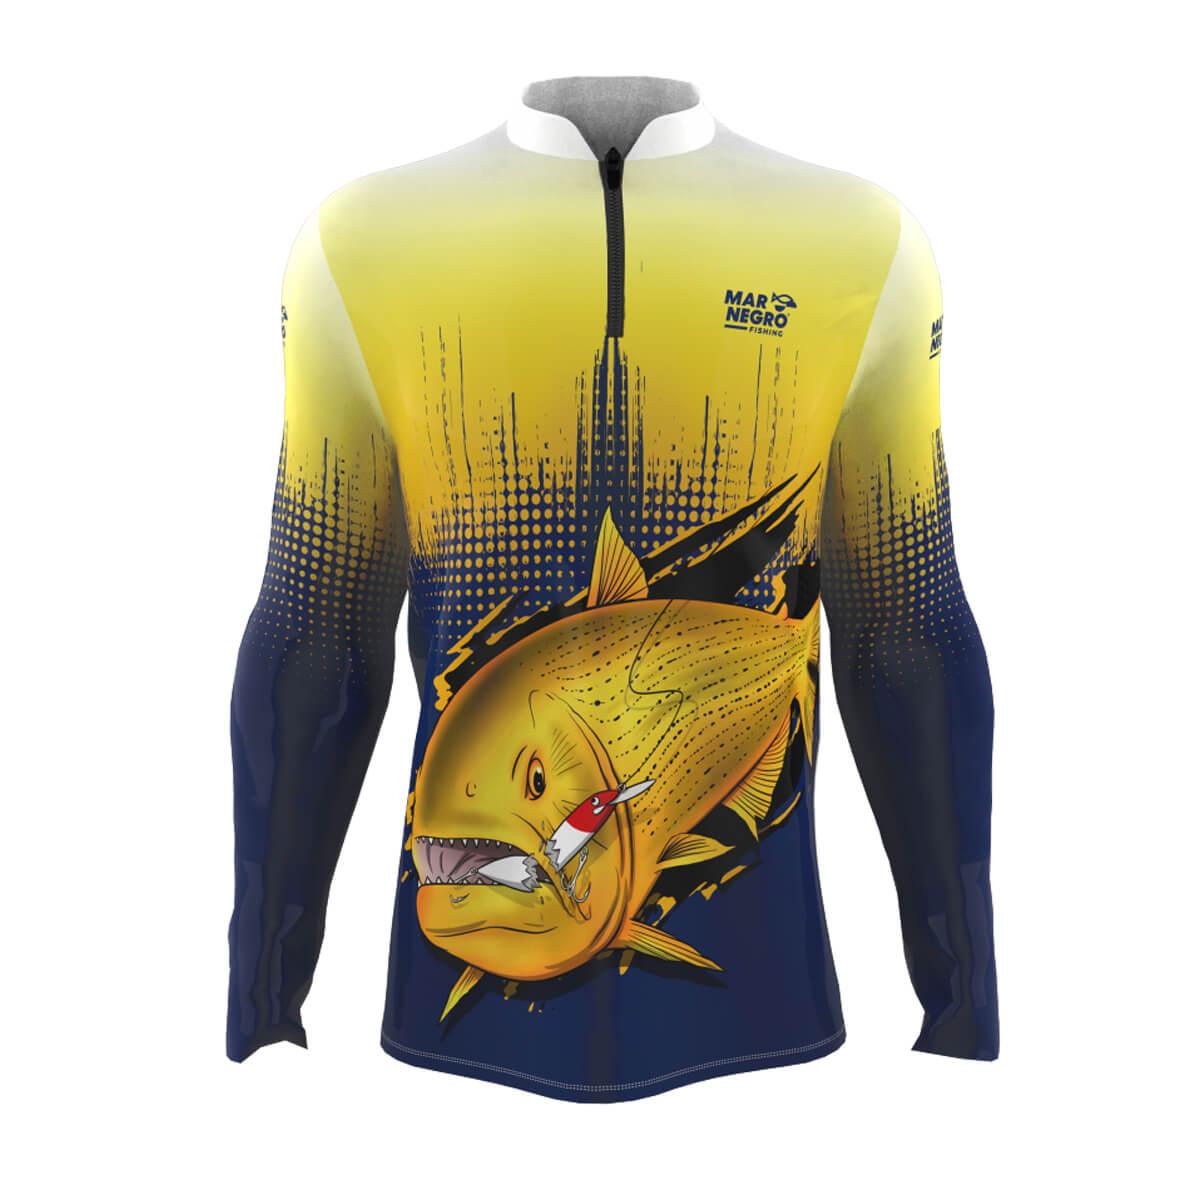 Camiseta Mar Negro 2021 Dourado  - Pró Pesca Shop